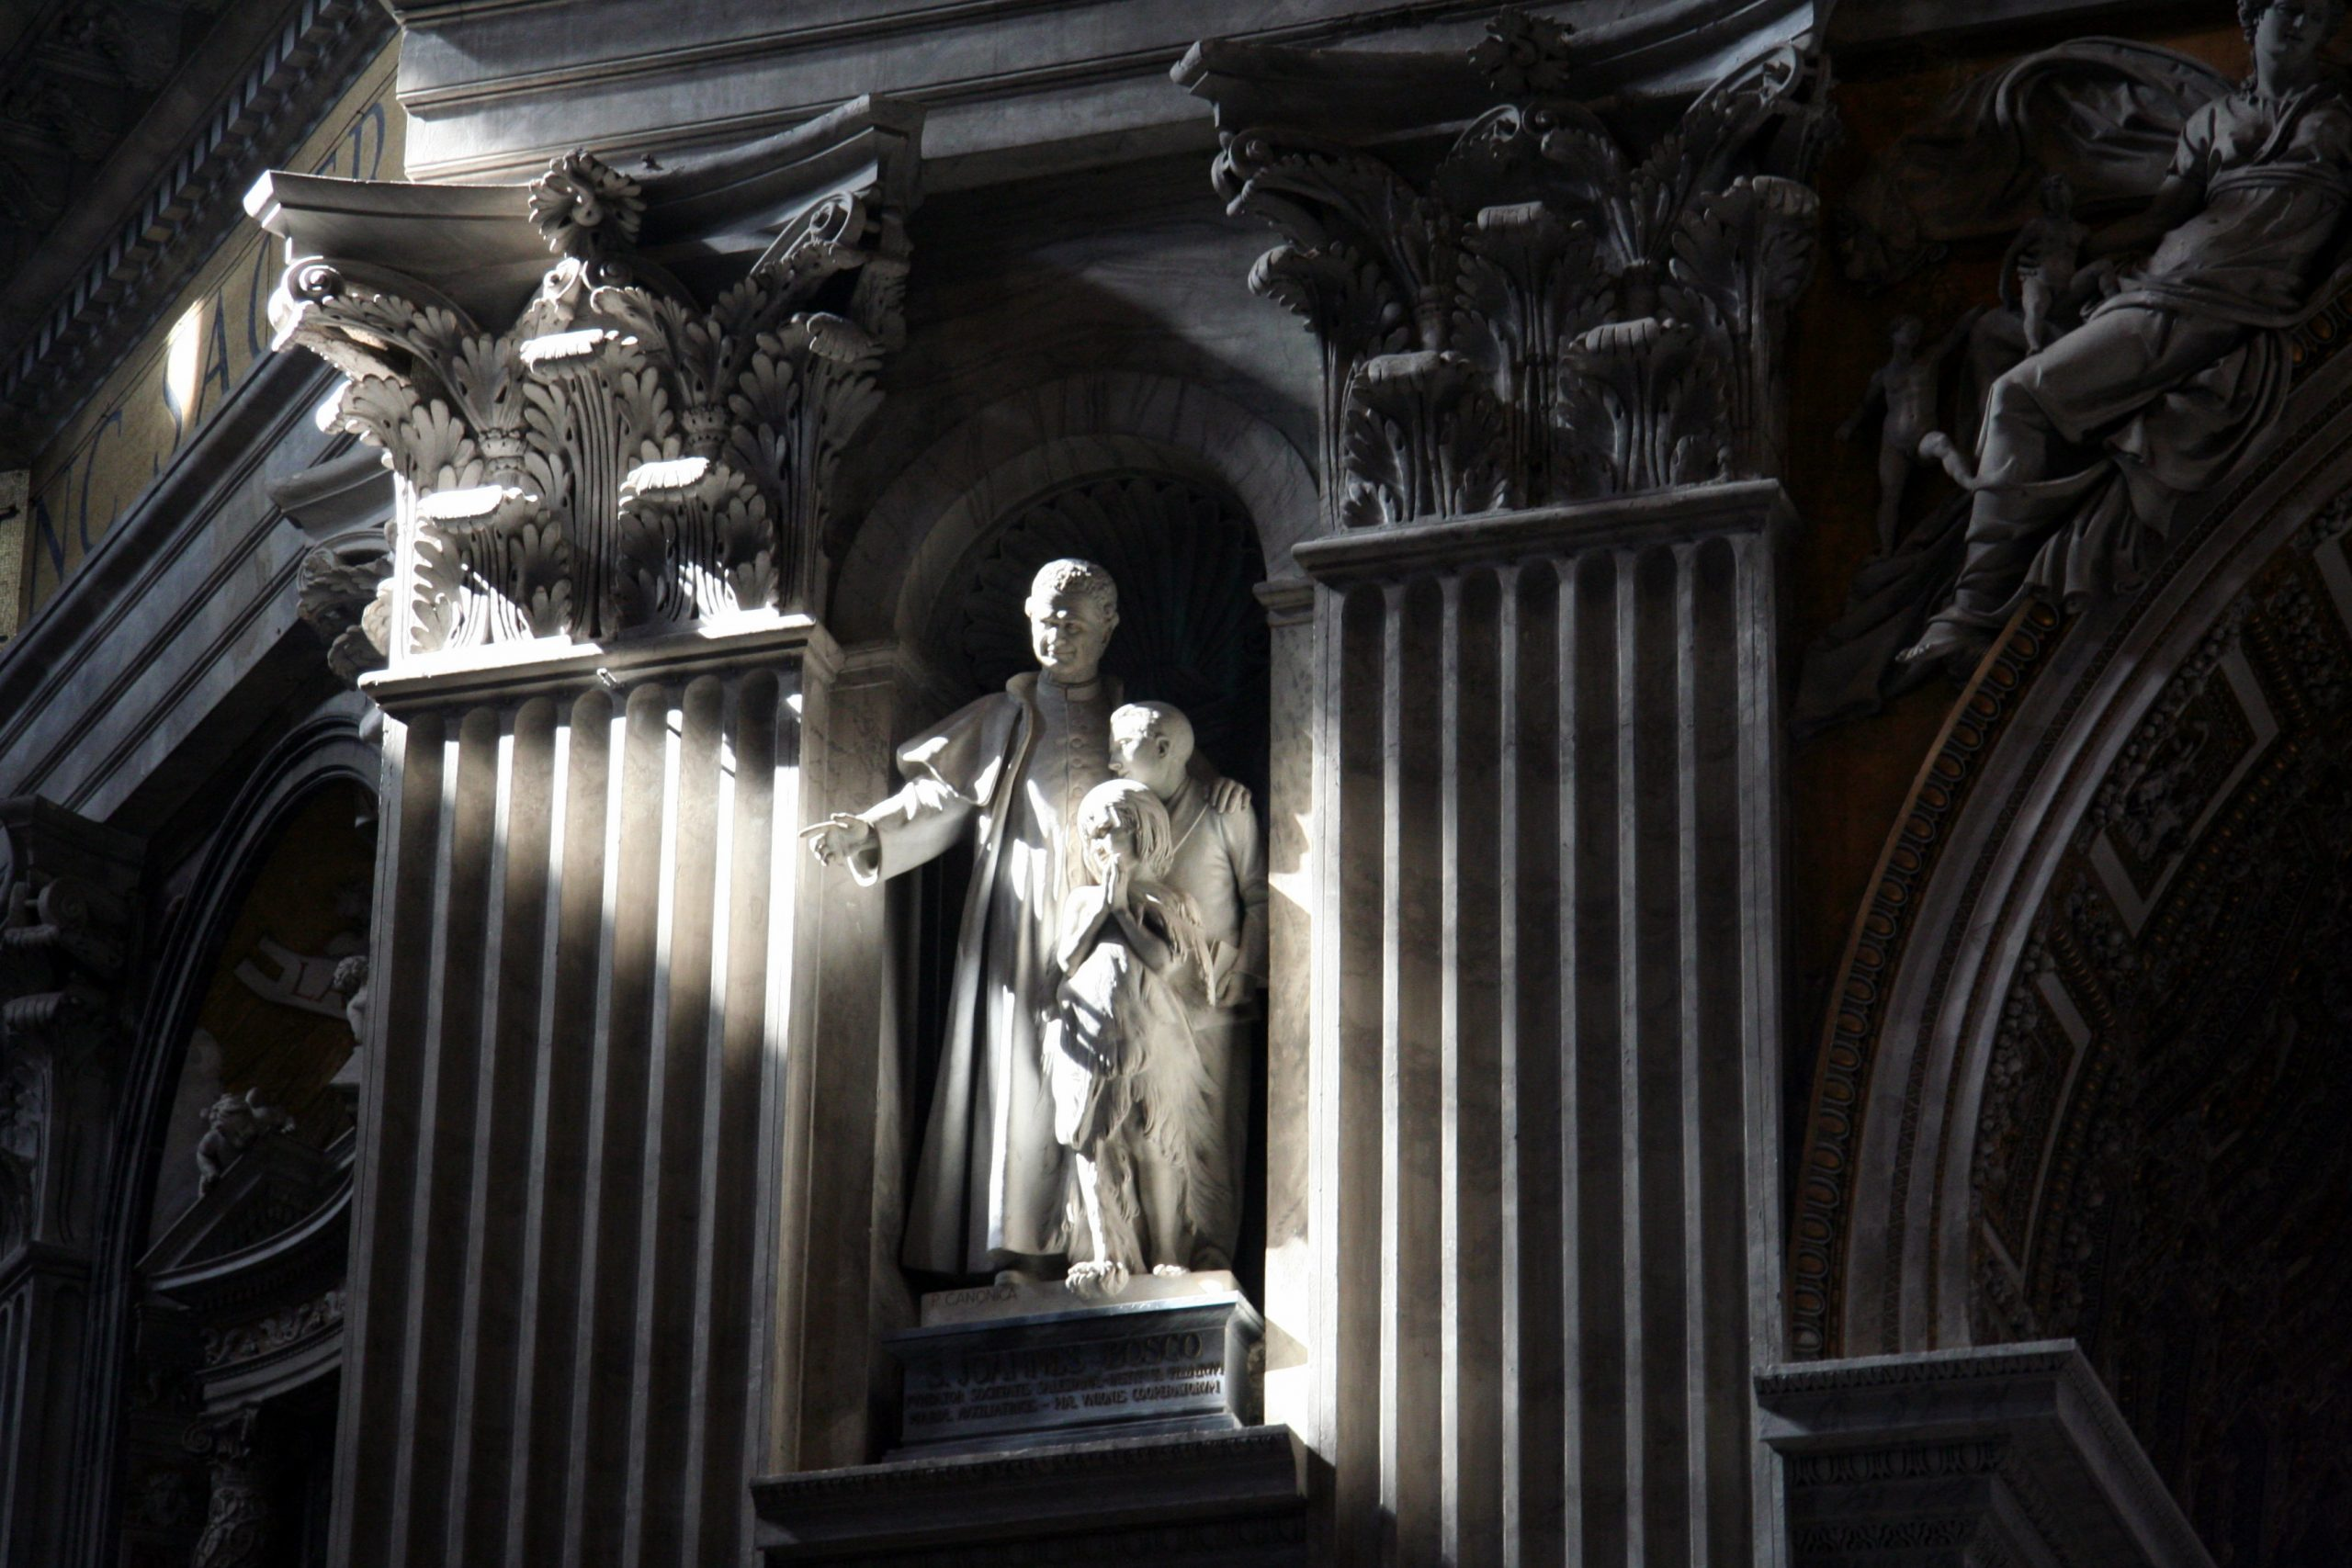 2008, St. Peter's Basilica, Vatican City, Italy